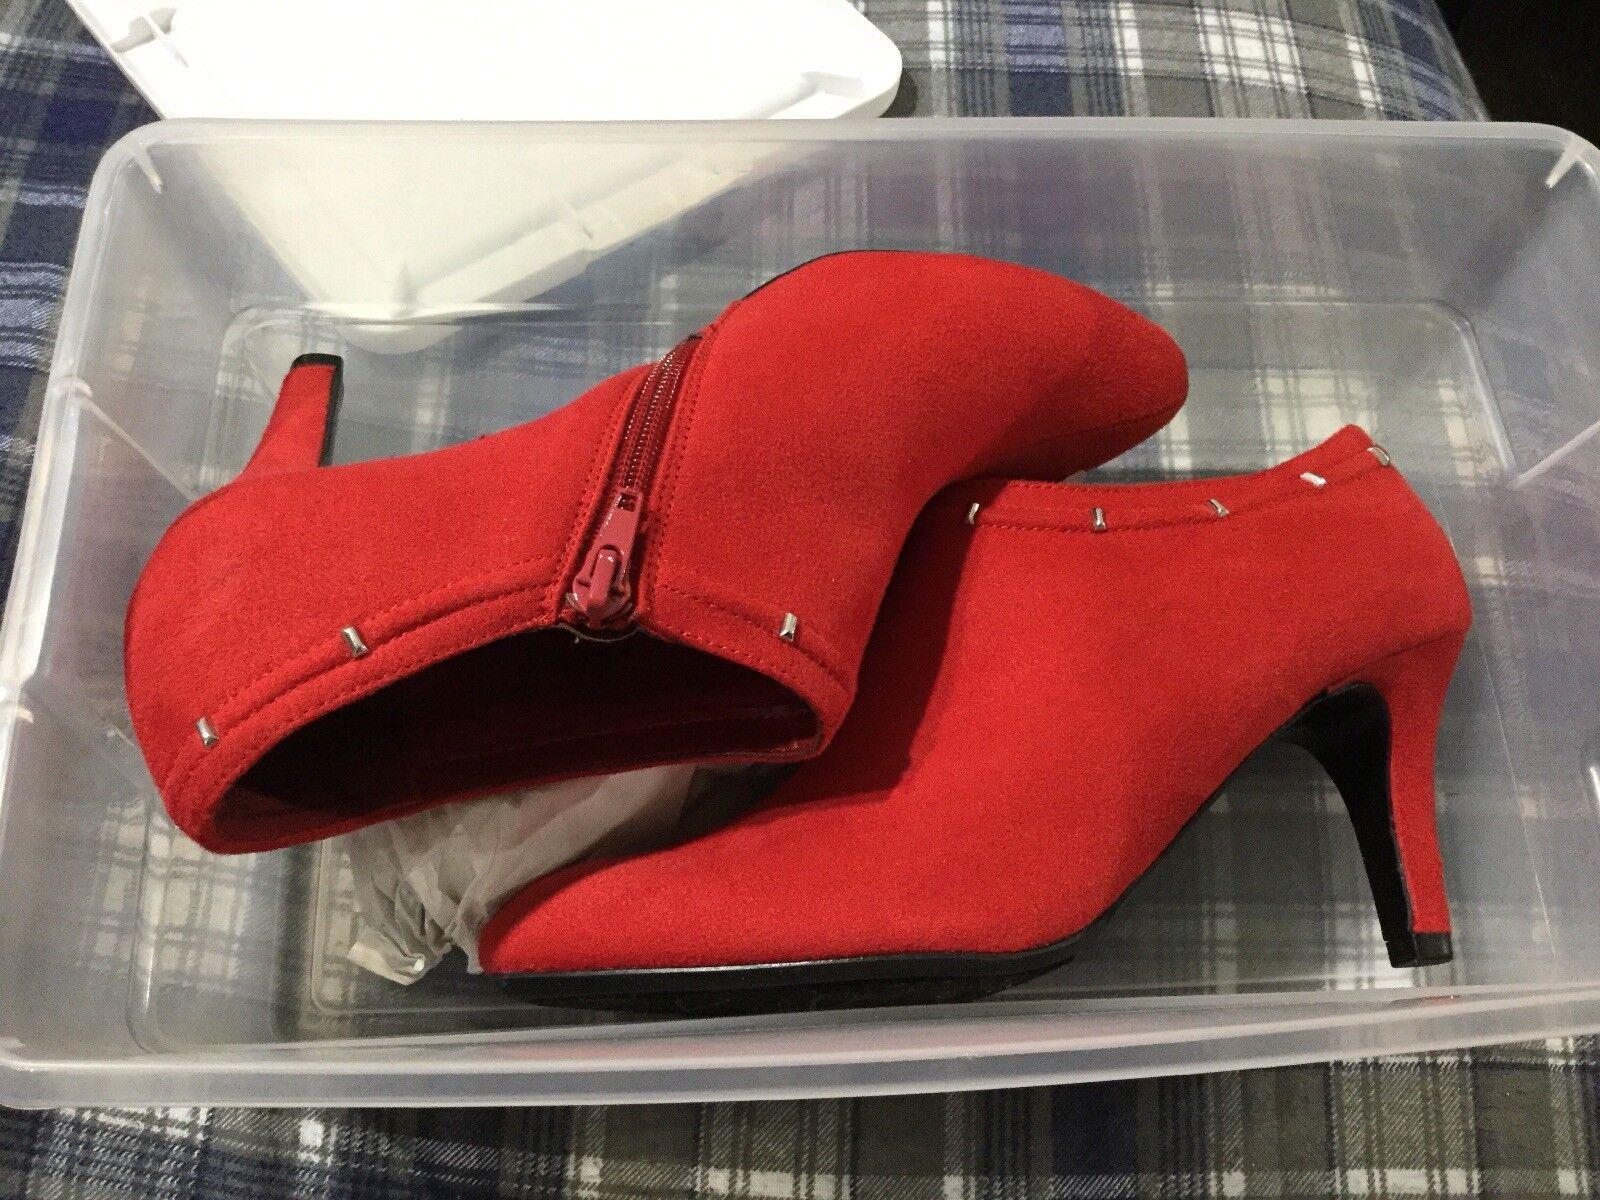 Convington red ankle boots size 7m